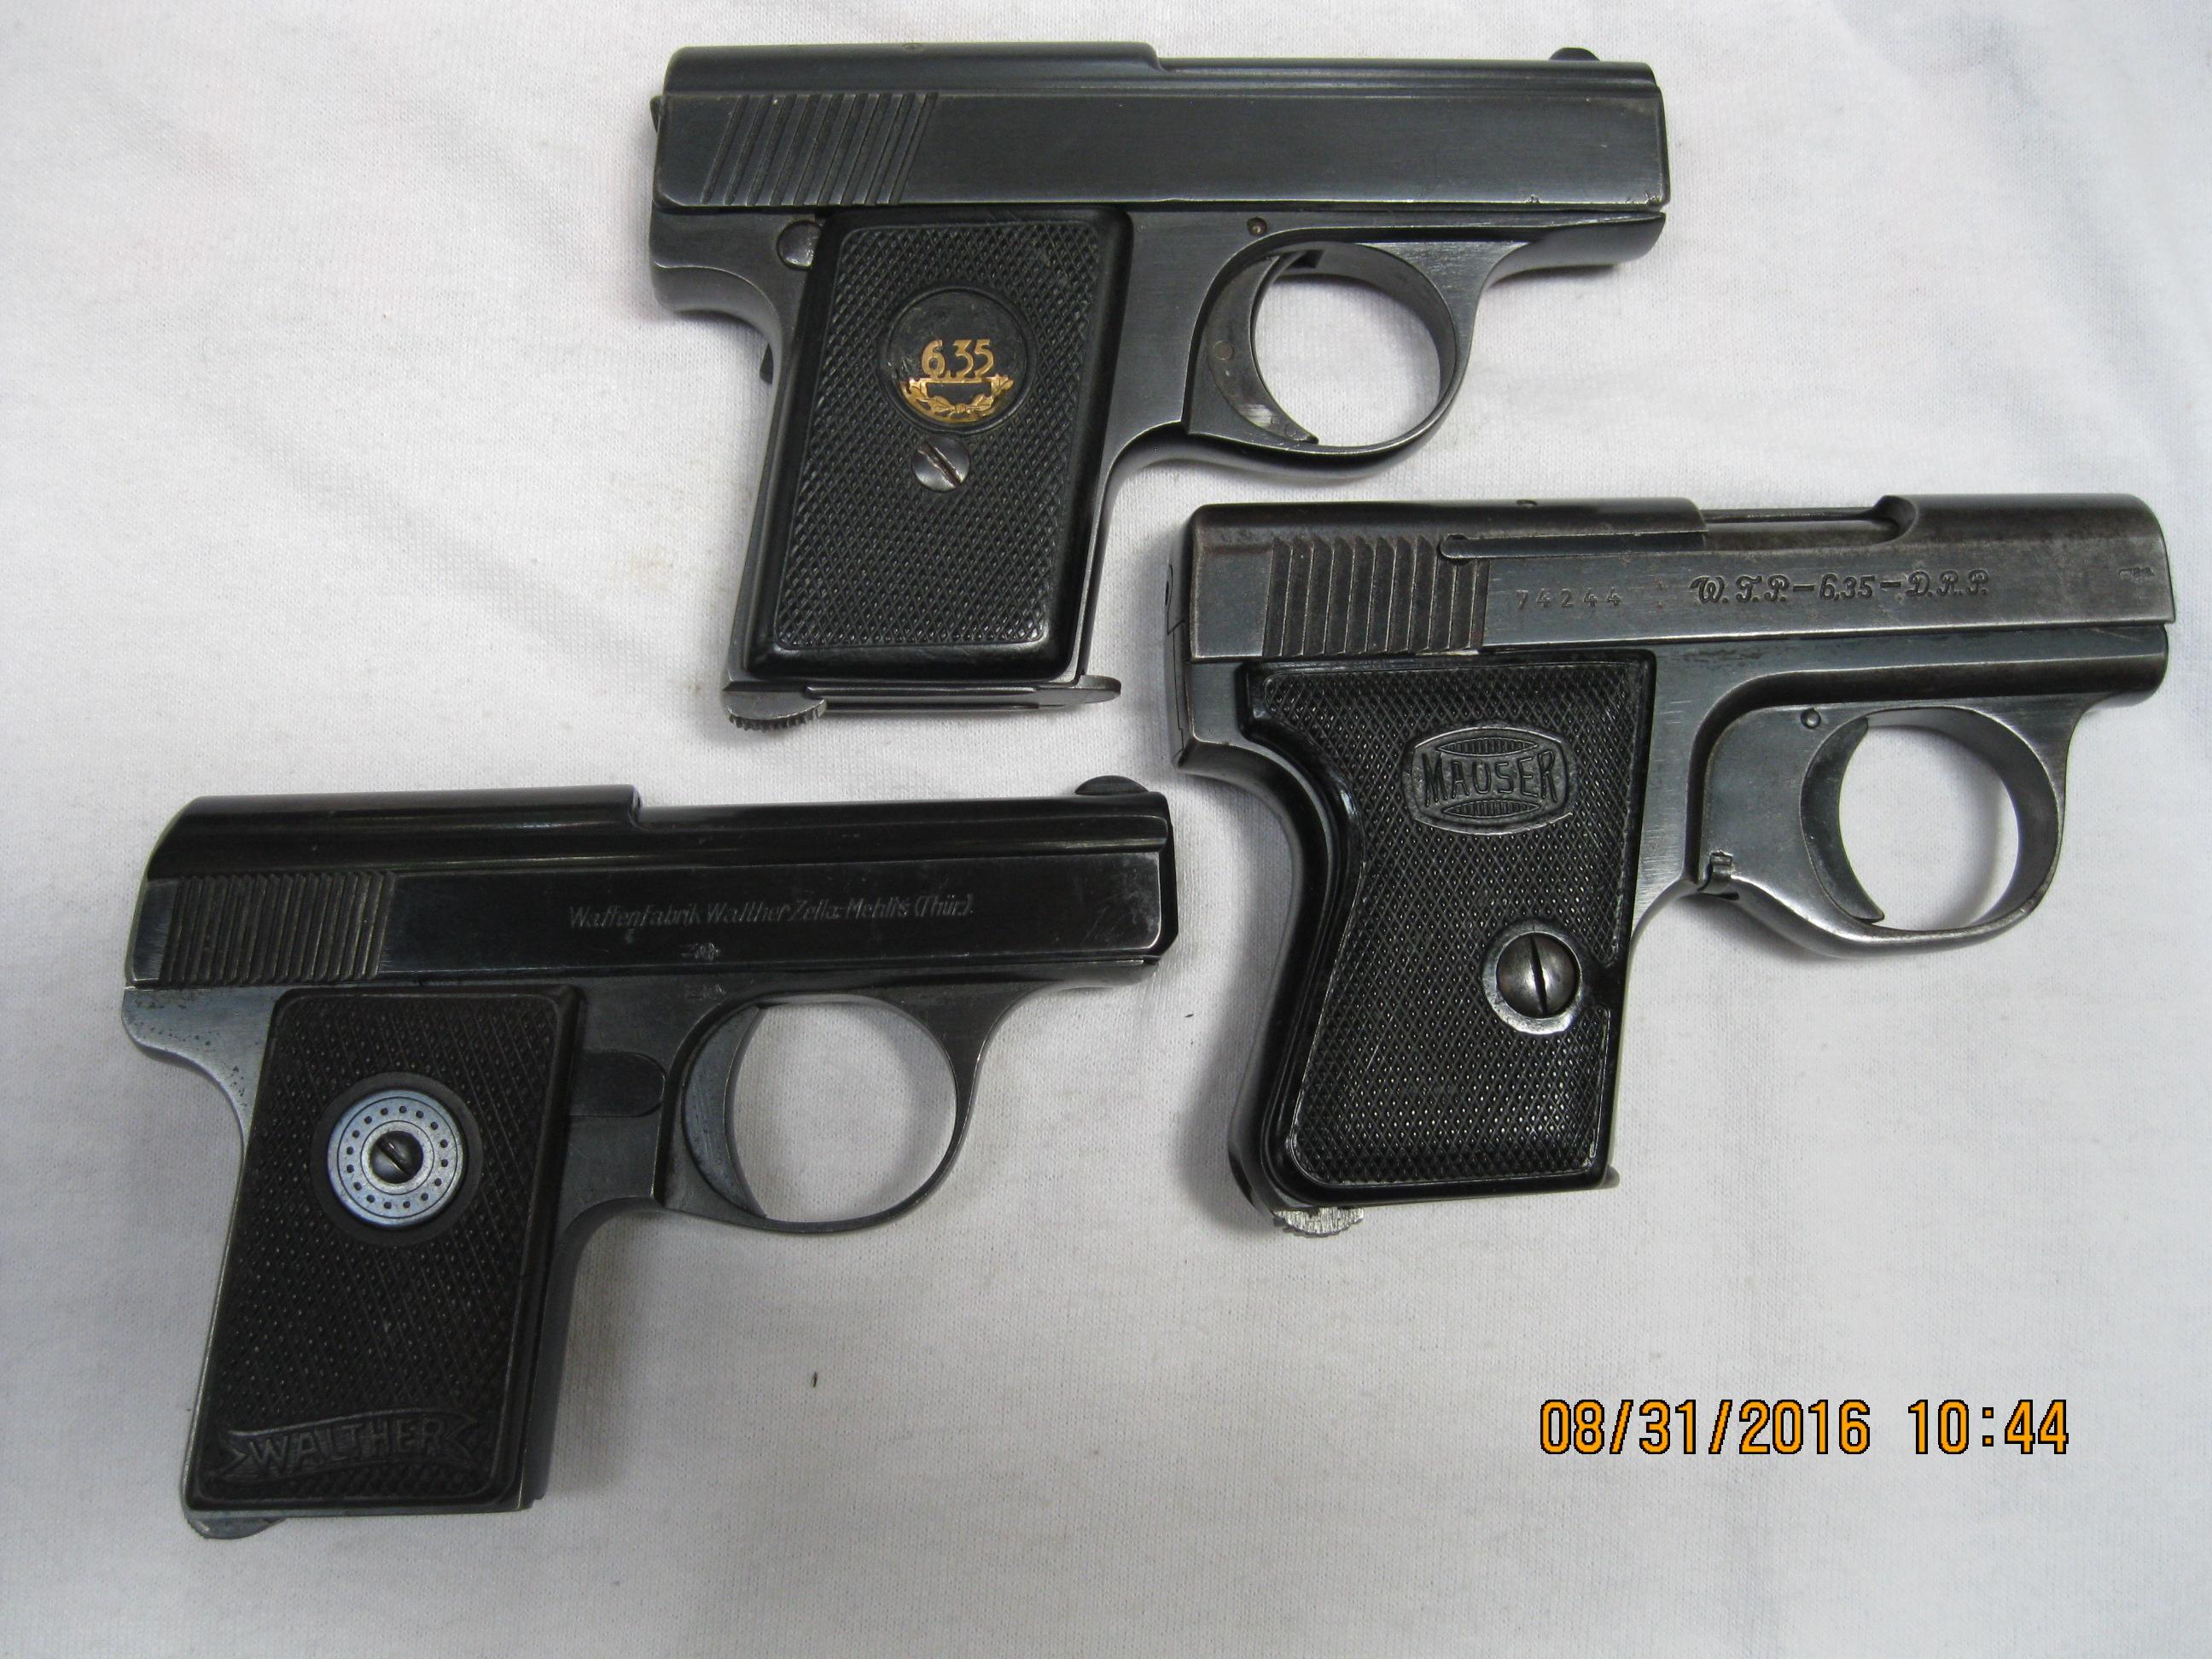 German pistols that penetrate vests